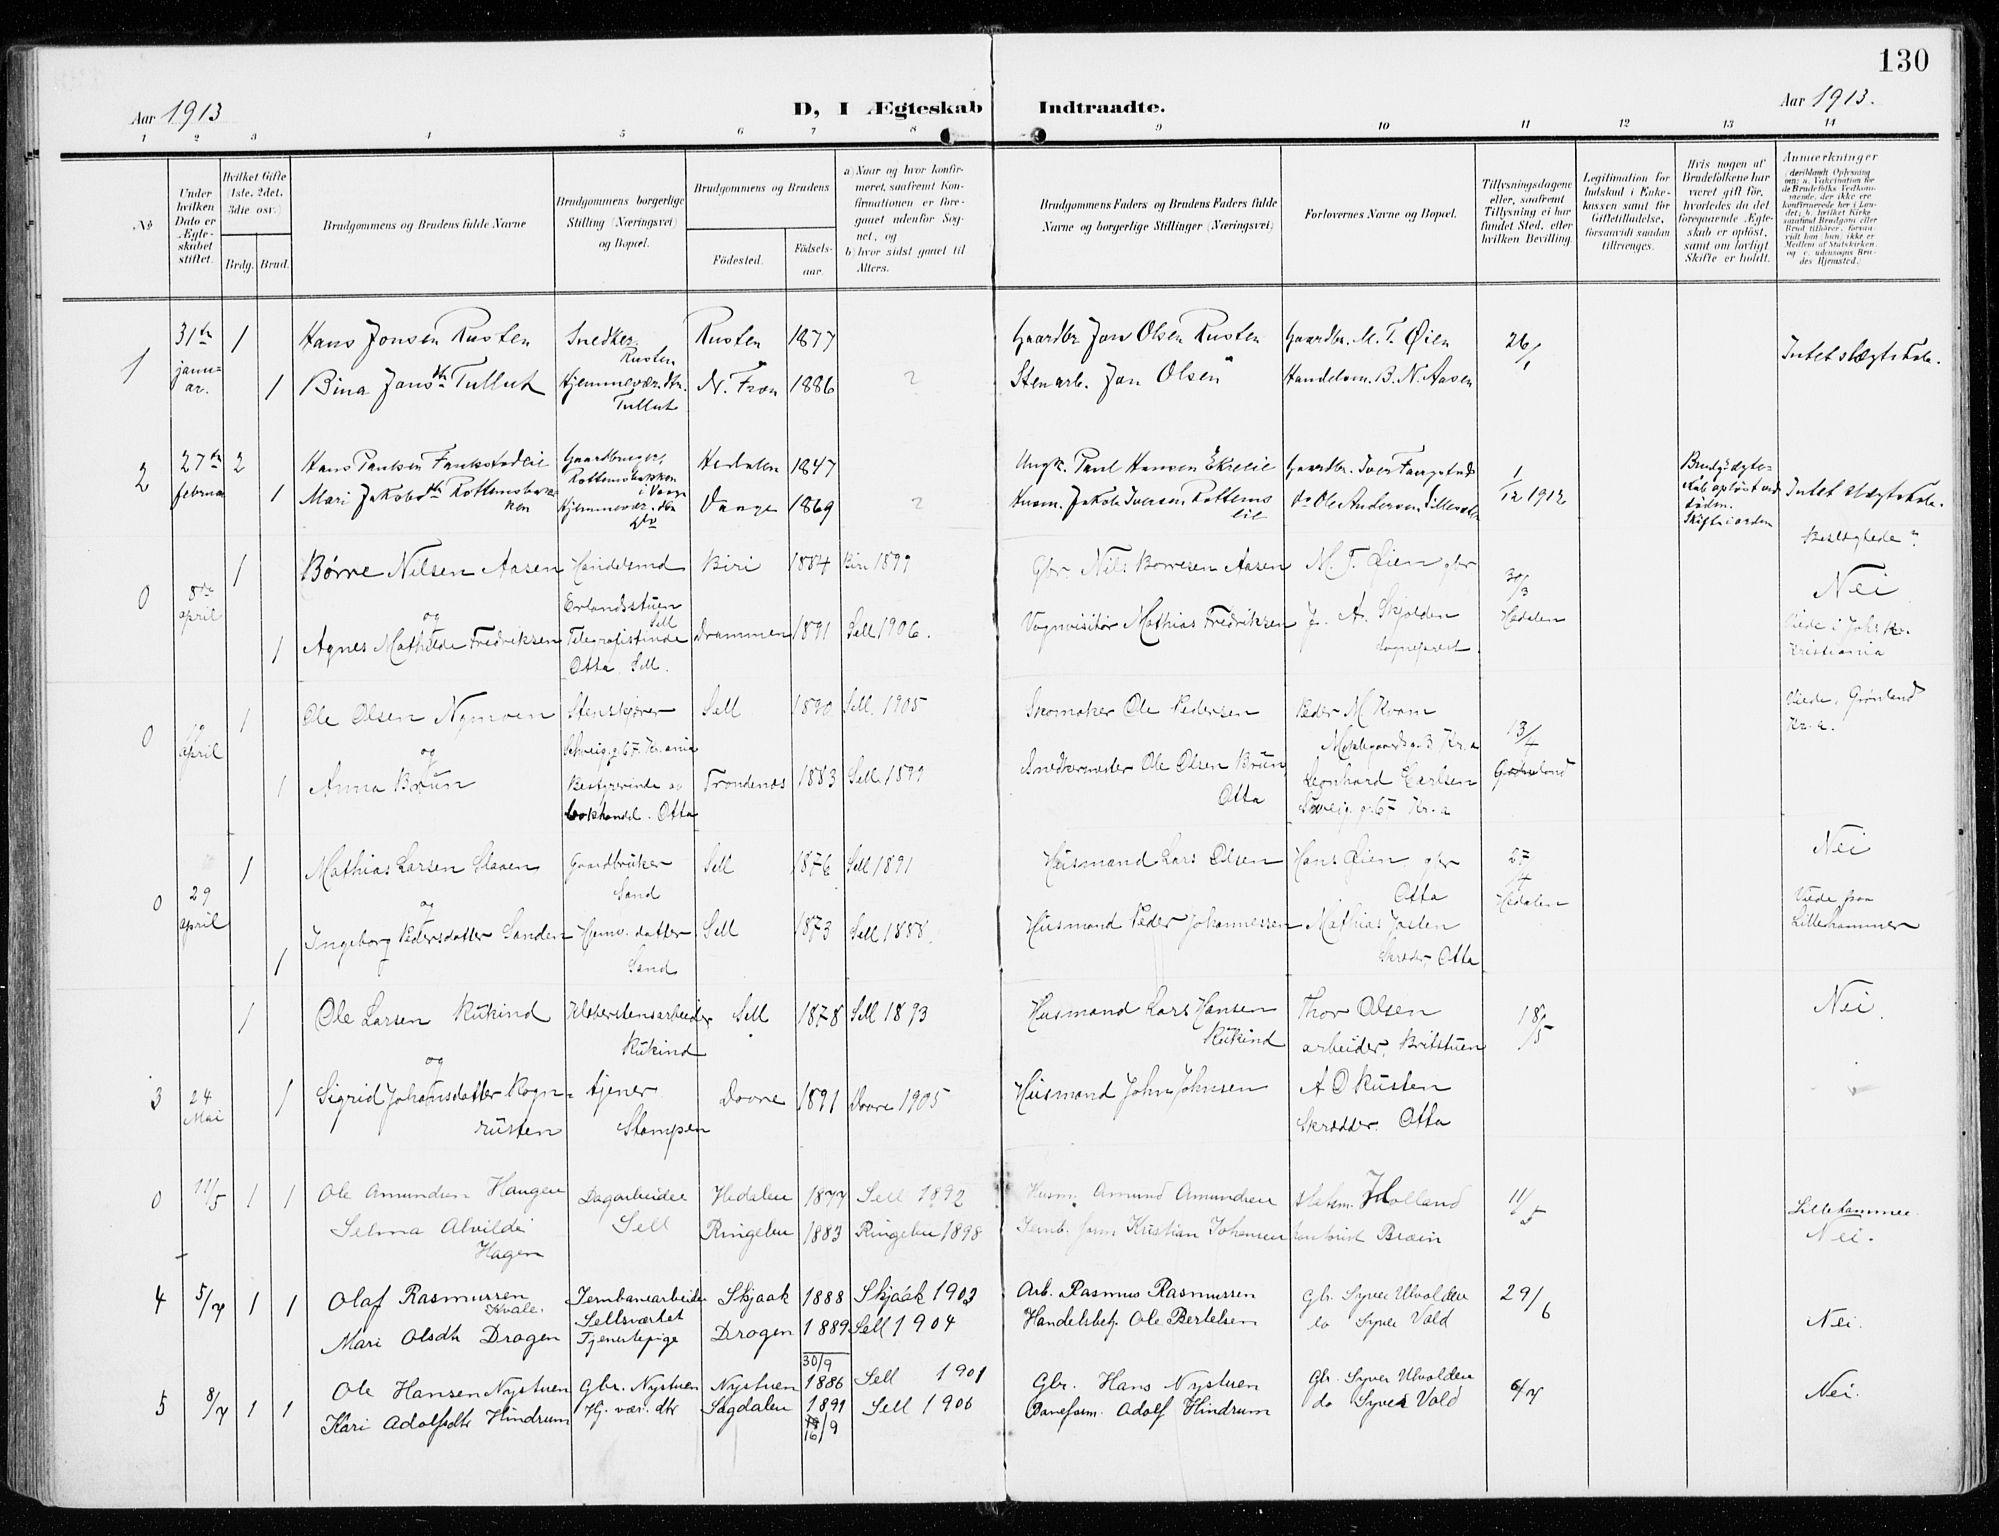 SAH, Sel prestekontor, Ministerialbok nr. 2, 1905-1919, s. 130